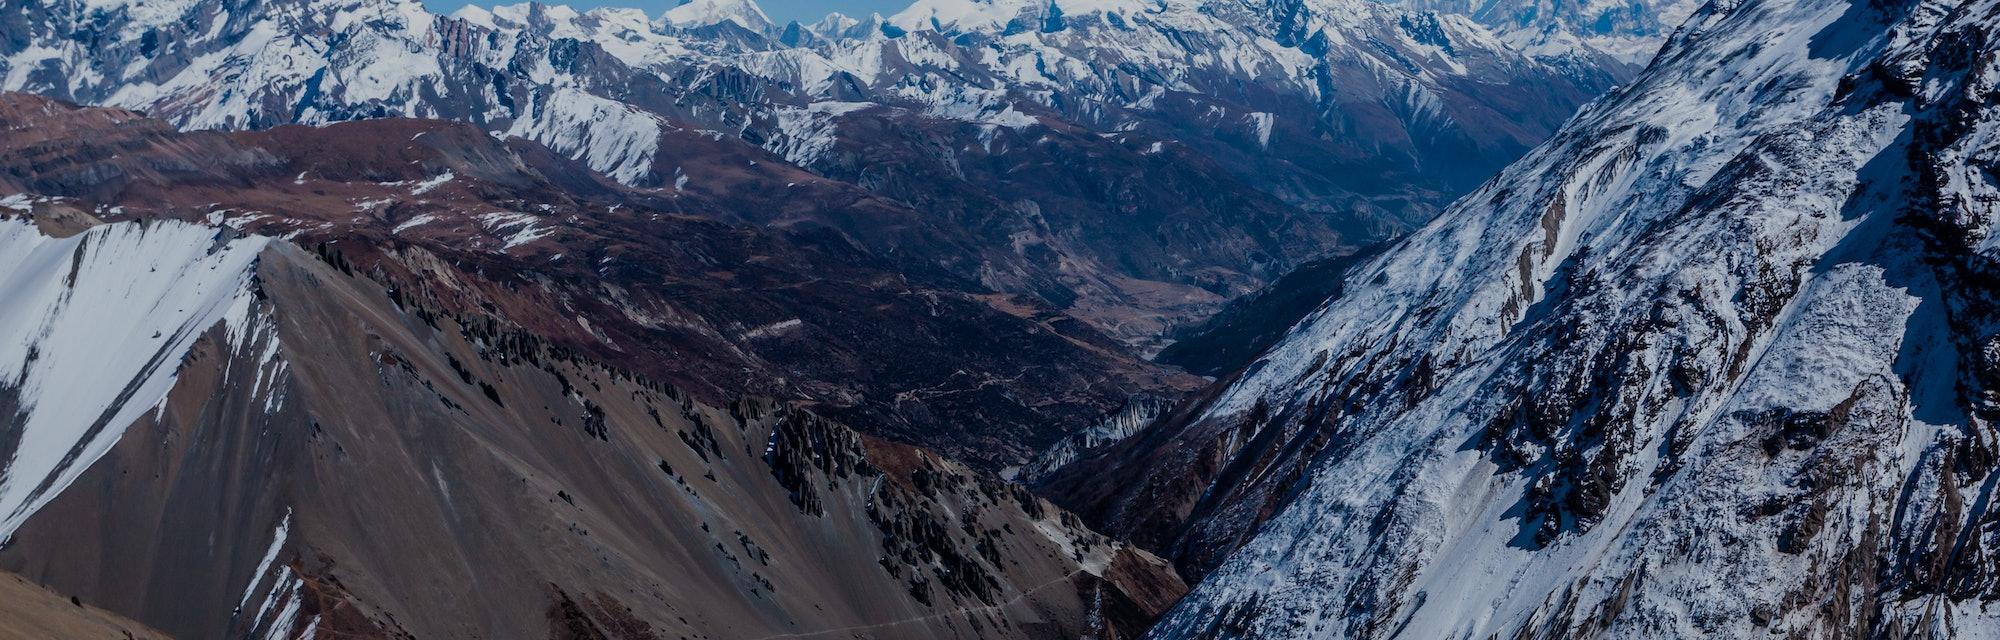 Himalayas mountains on the way to Tilicho lake (Tilicho Tal 4920 m). Annapurna Trek, Himalaya, Nepal.